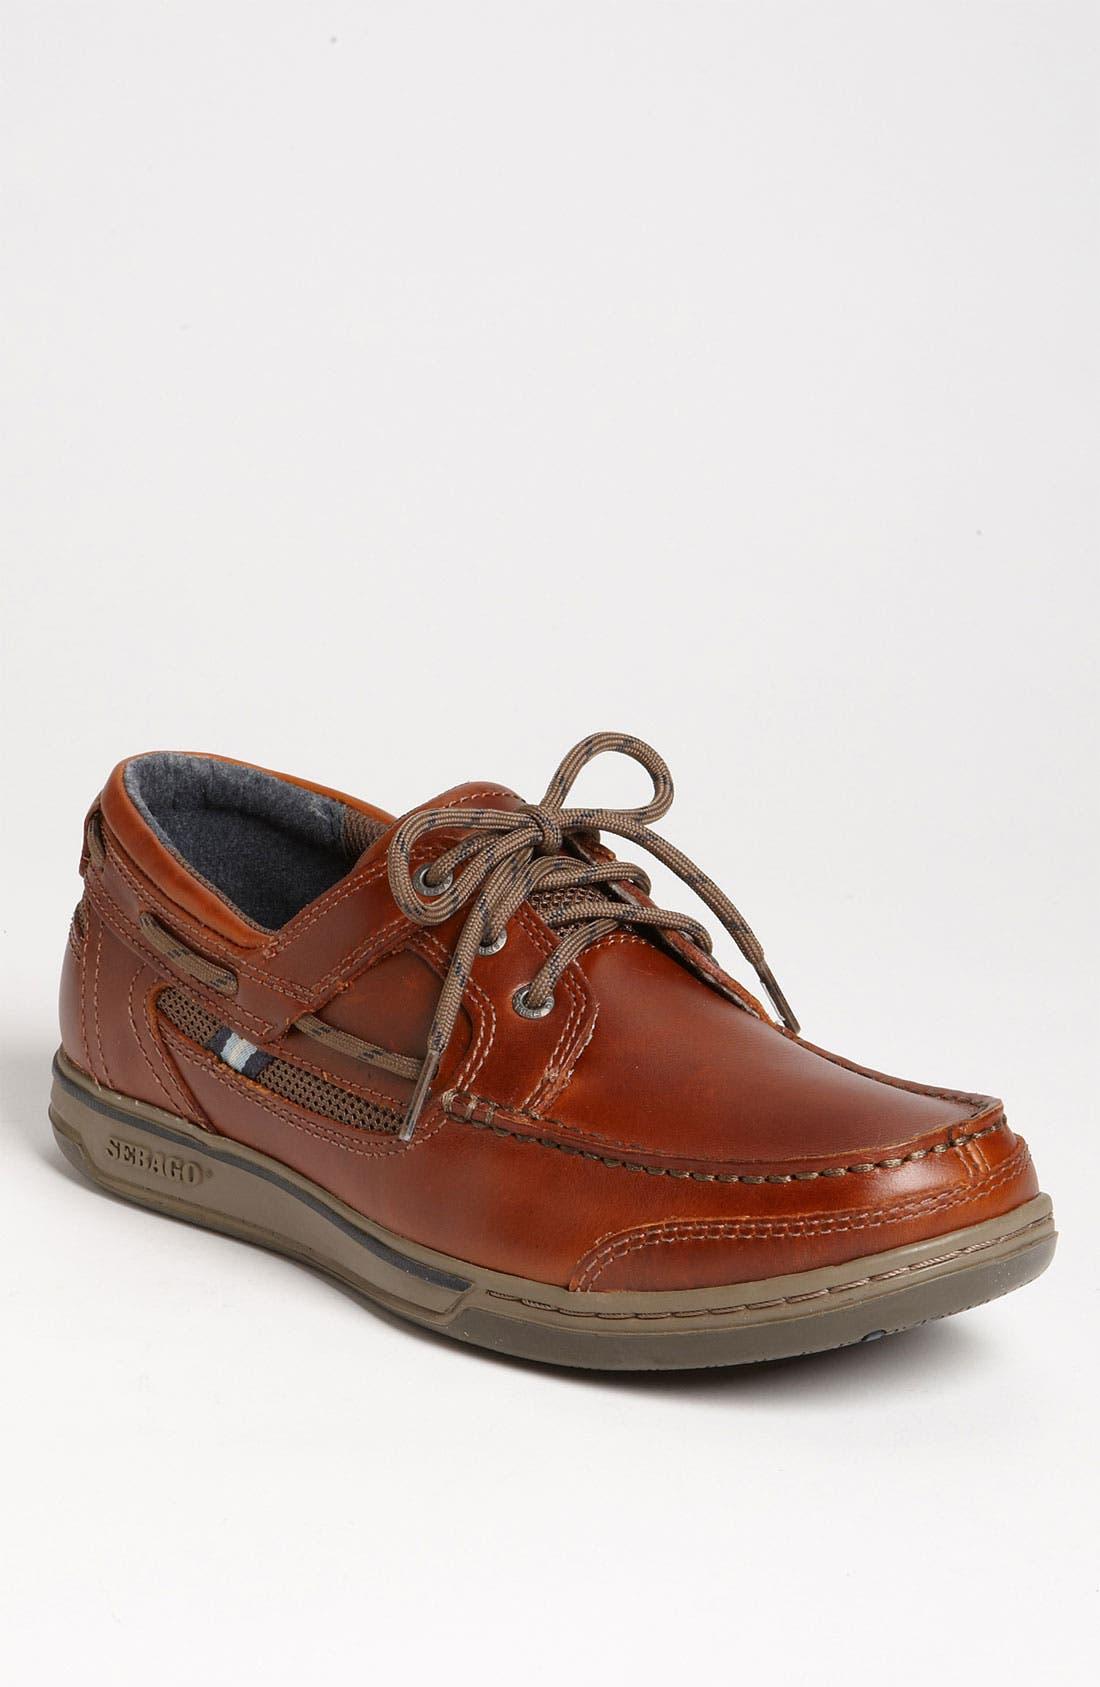 Main Image - Sebago 'Triton' Boat Shoe